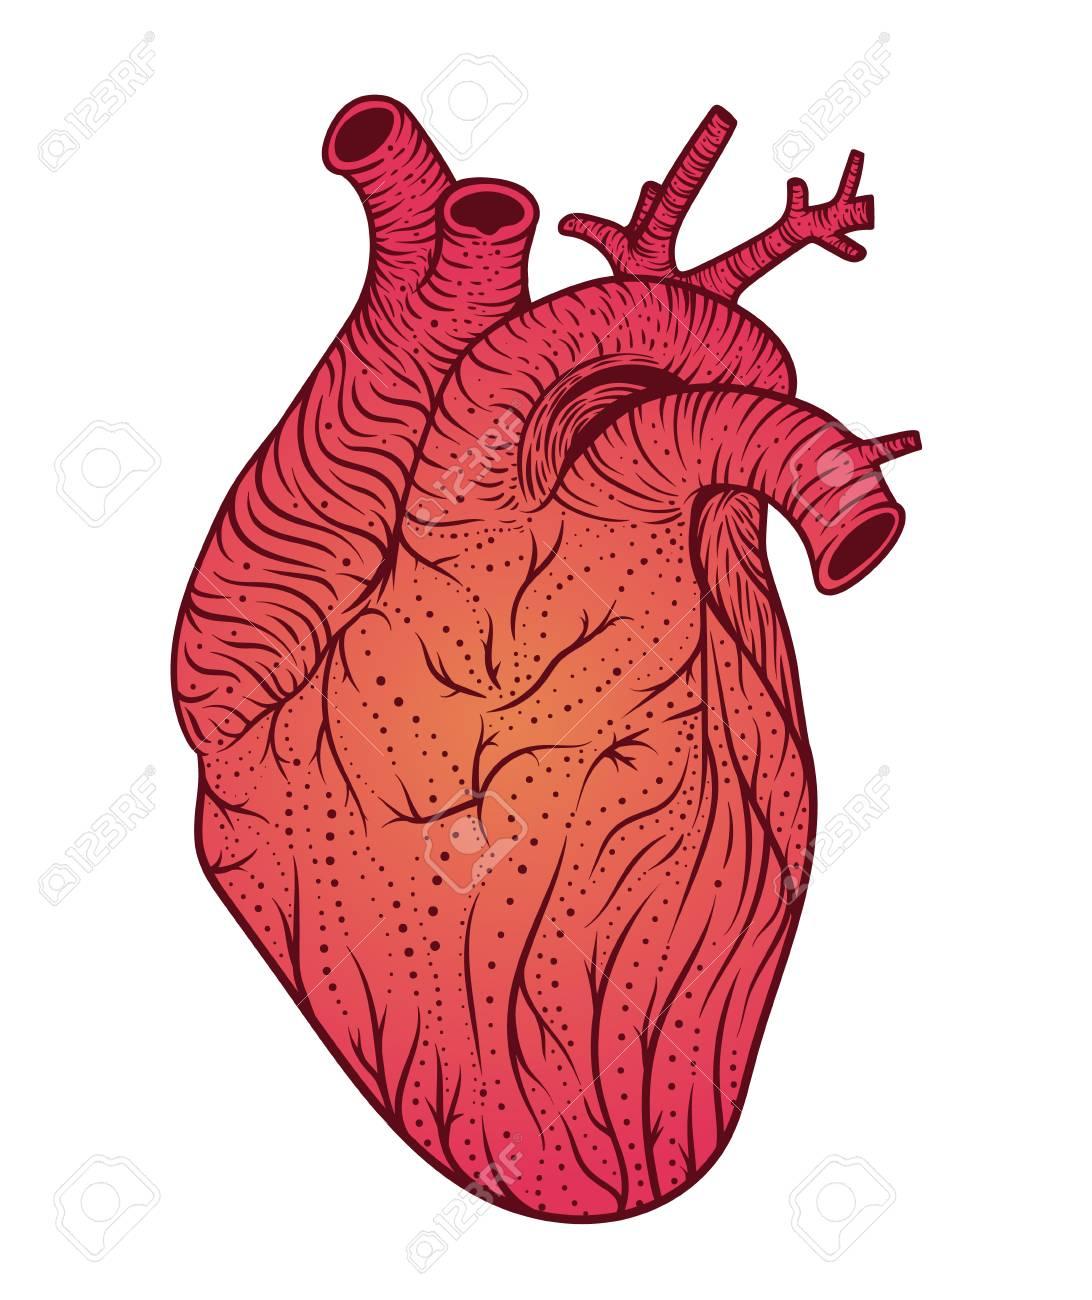 Human Heart Line Art. Vector Illustration. Tattoo Style. Vintage ...